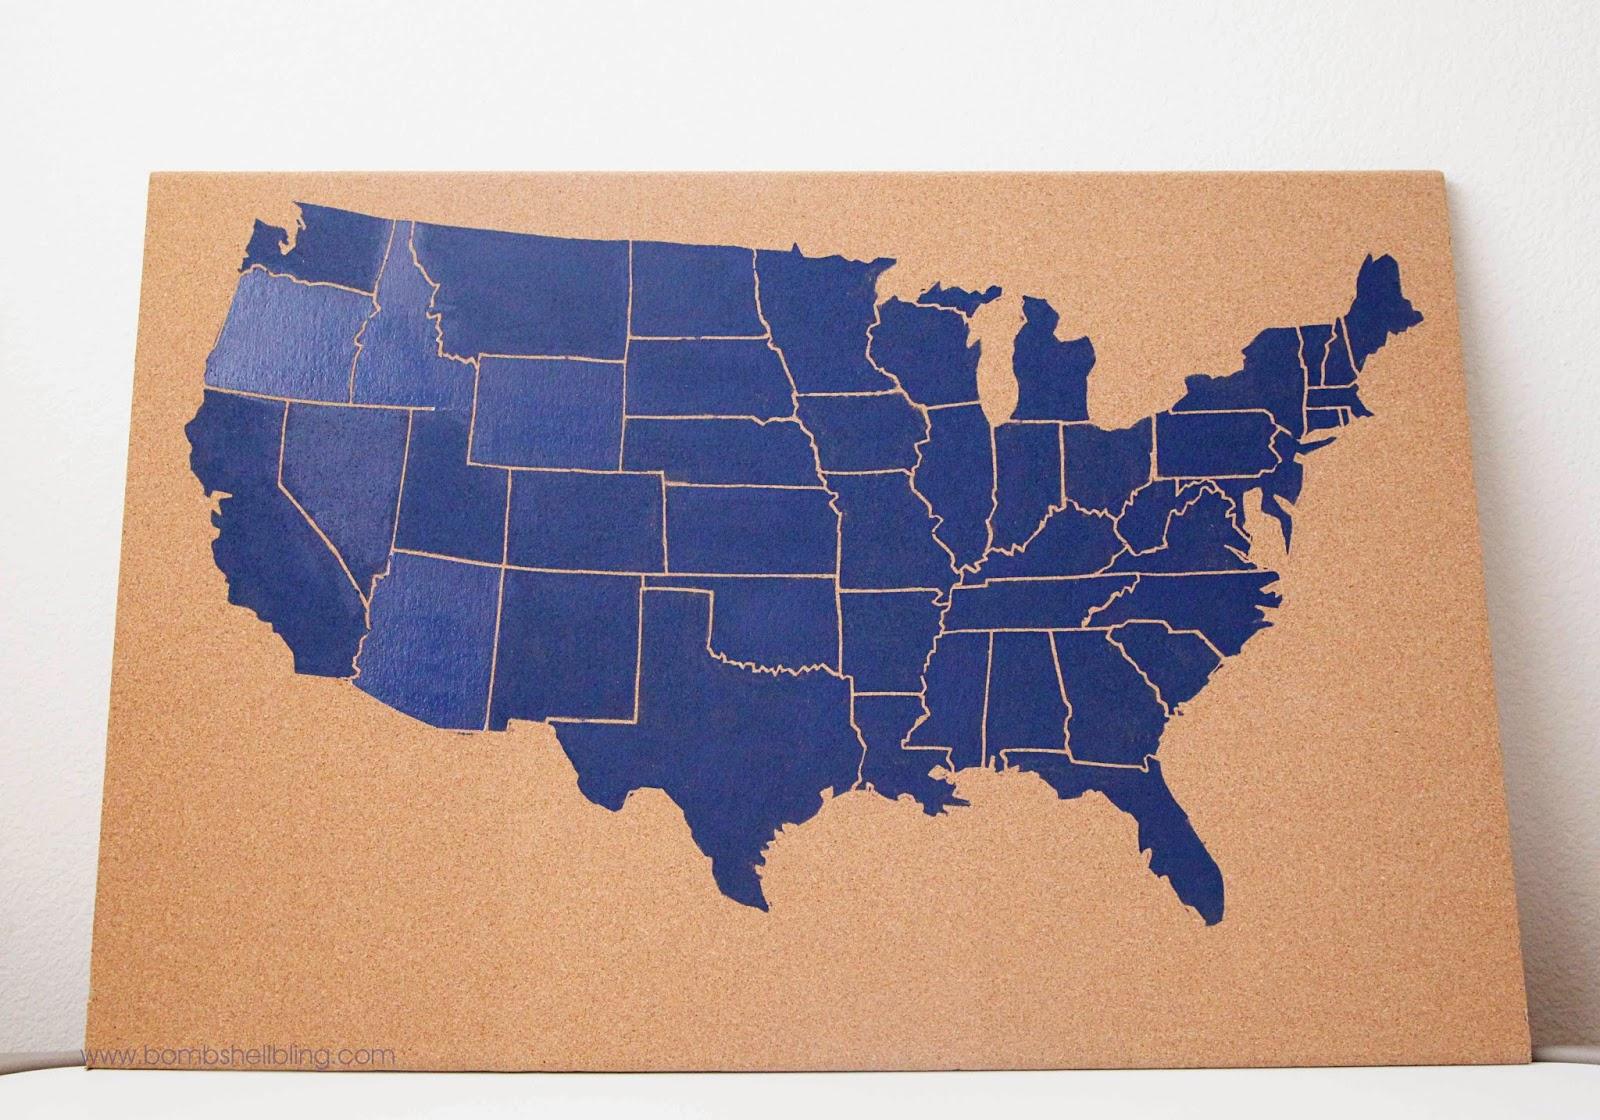 Bootleggers Map Of The United States Edward McCandlish The Rail